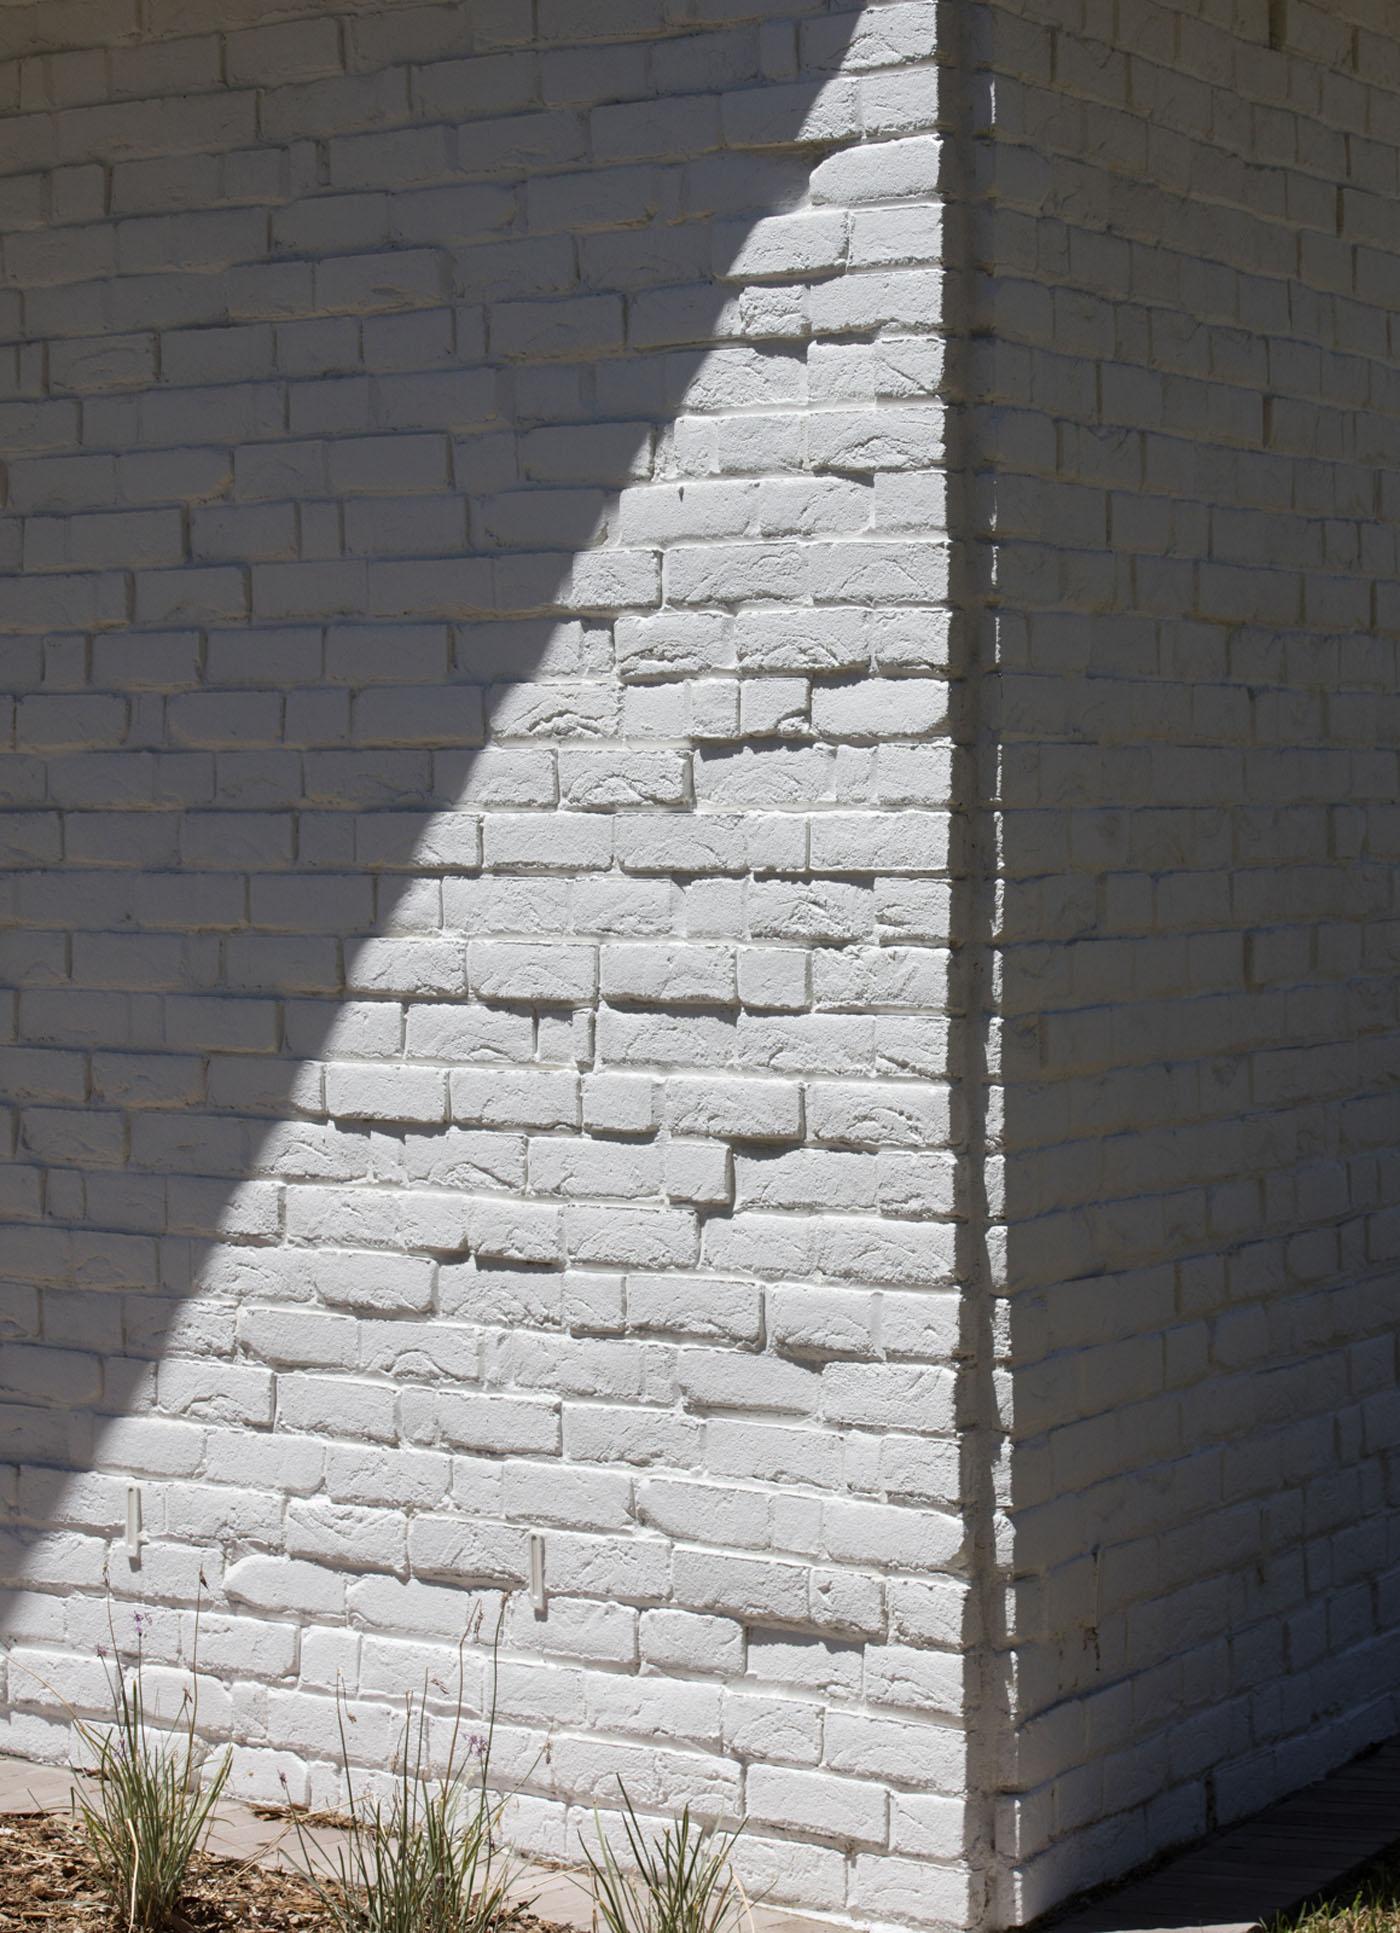 Sydenham Green Amenities by Sam Crawford Architects, Sydney. Rough textured bricks, painted white.